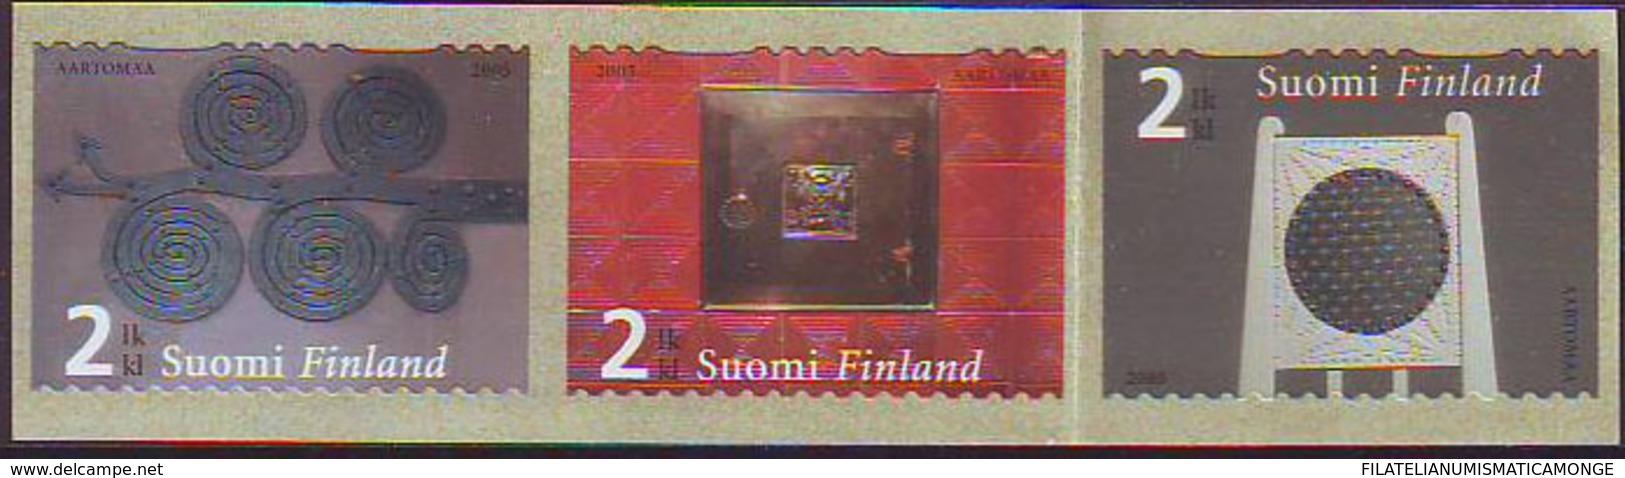 Finlandia 2005  Yvert Tellier  1706/08 Arte Decorativo (3s) ** - Finland